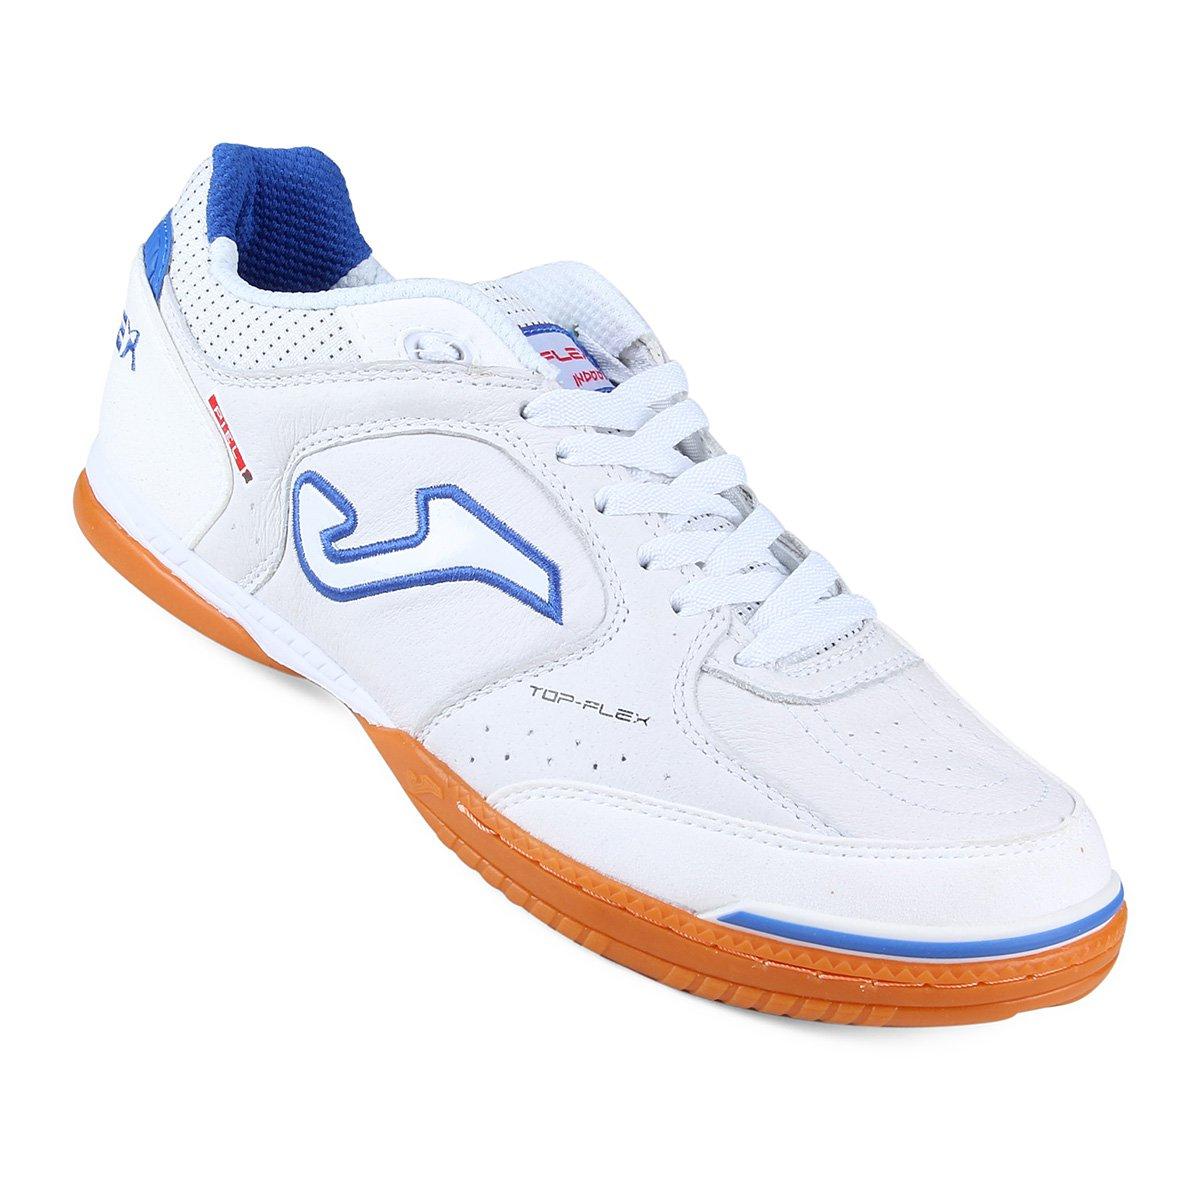 b071f0f48c Chuteira Futsal Joma Top Flex - Branco e Azul Claro - Compre Agora ...